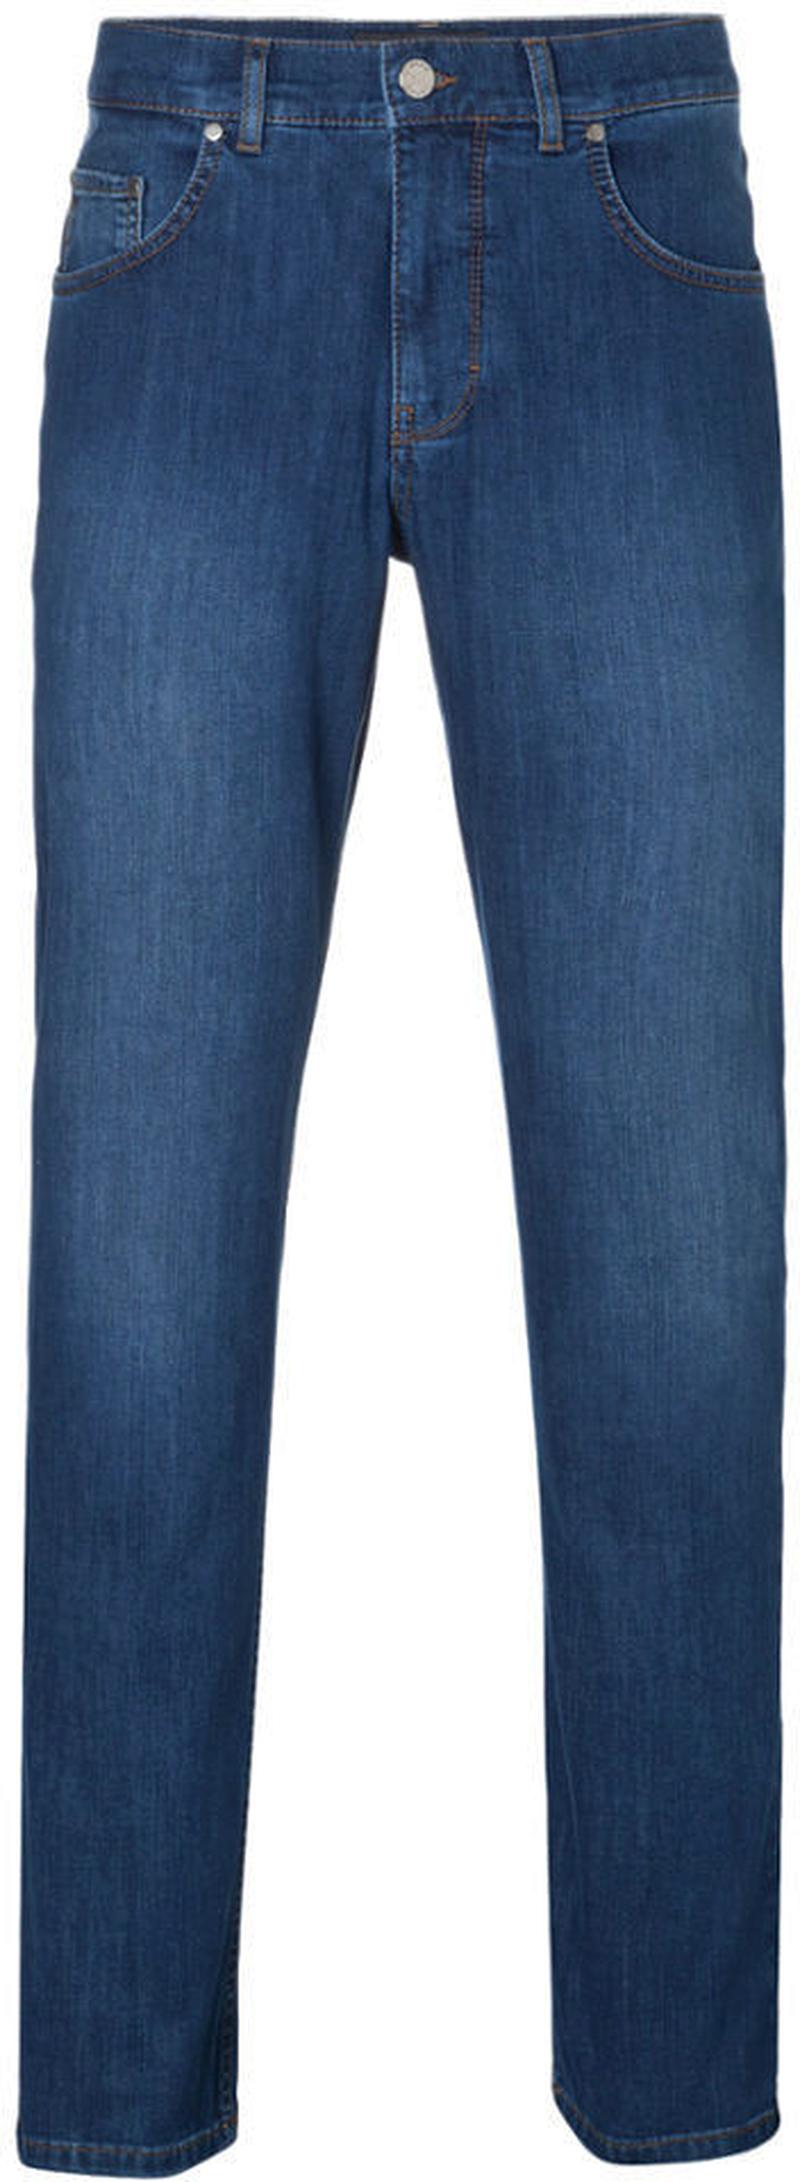 Brax Cooper Denim Jeans Blue Five Pocket foto 0